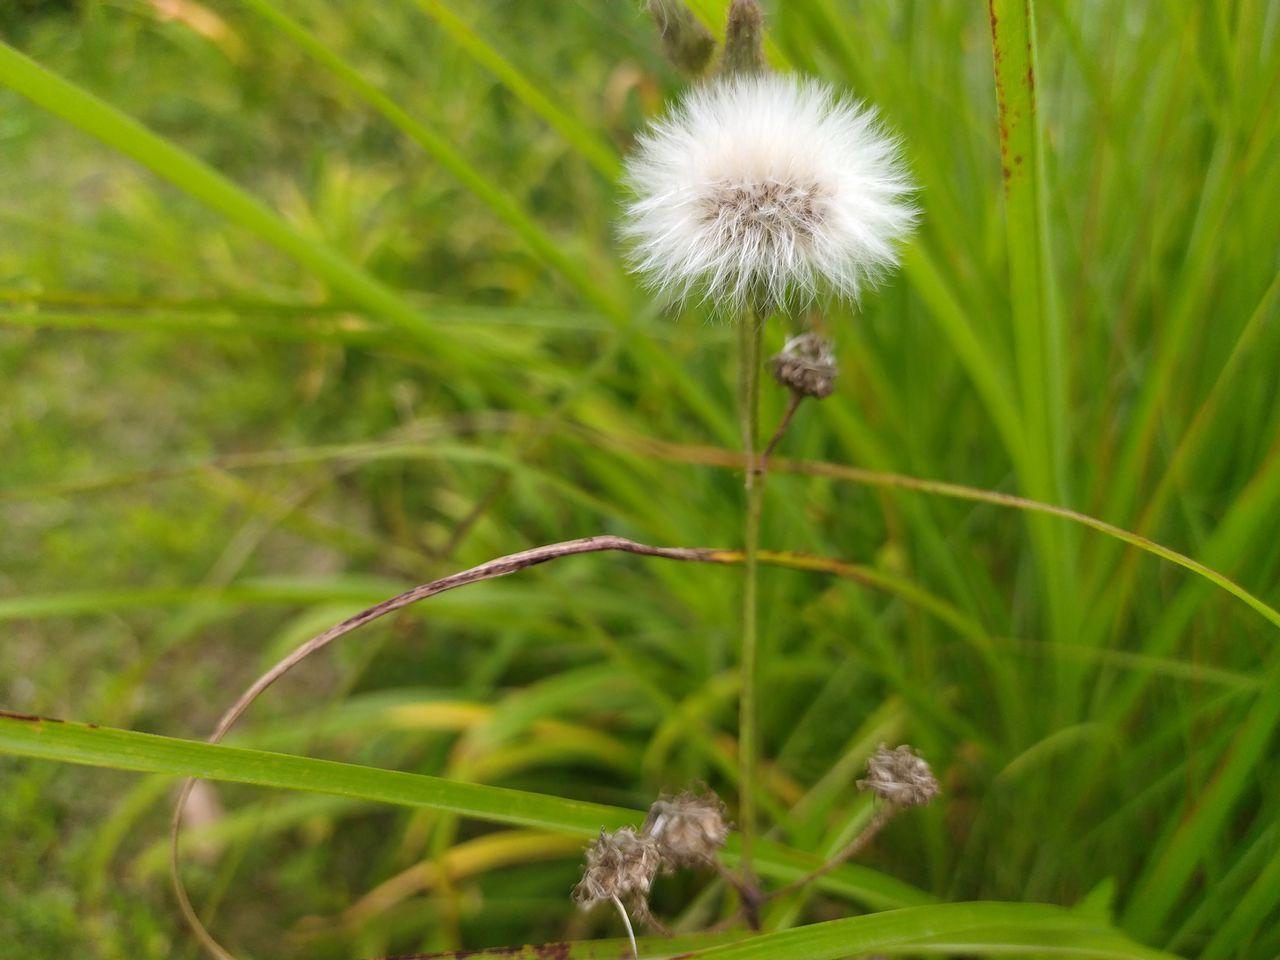 CLOSE-UP OF DANDELION FLOWER GROWING ON FIELD